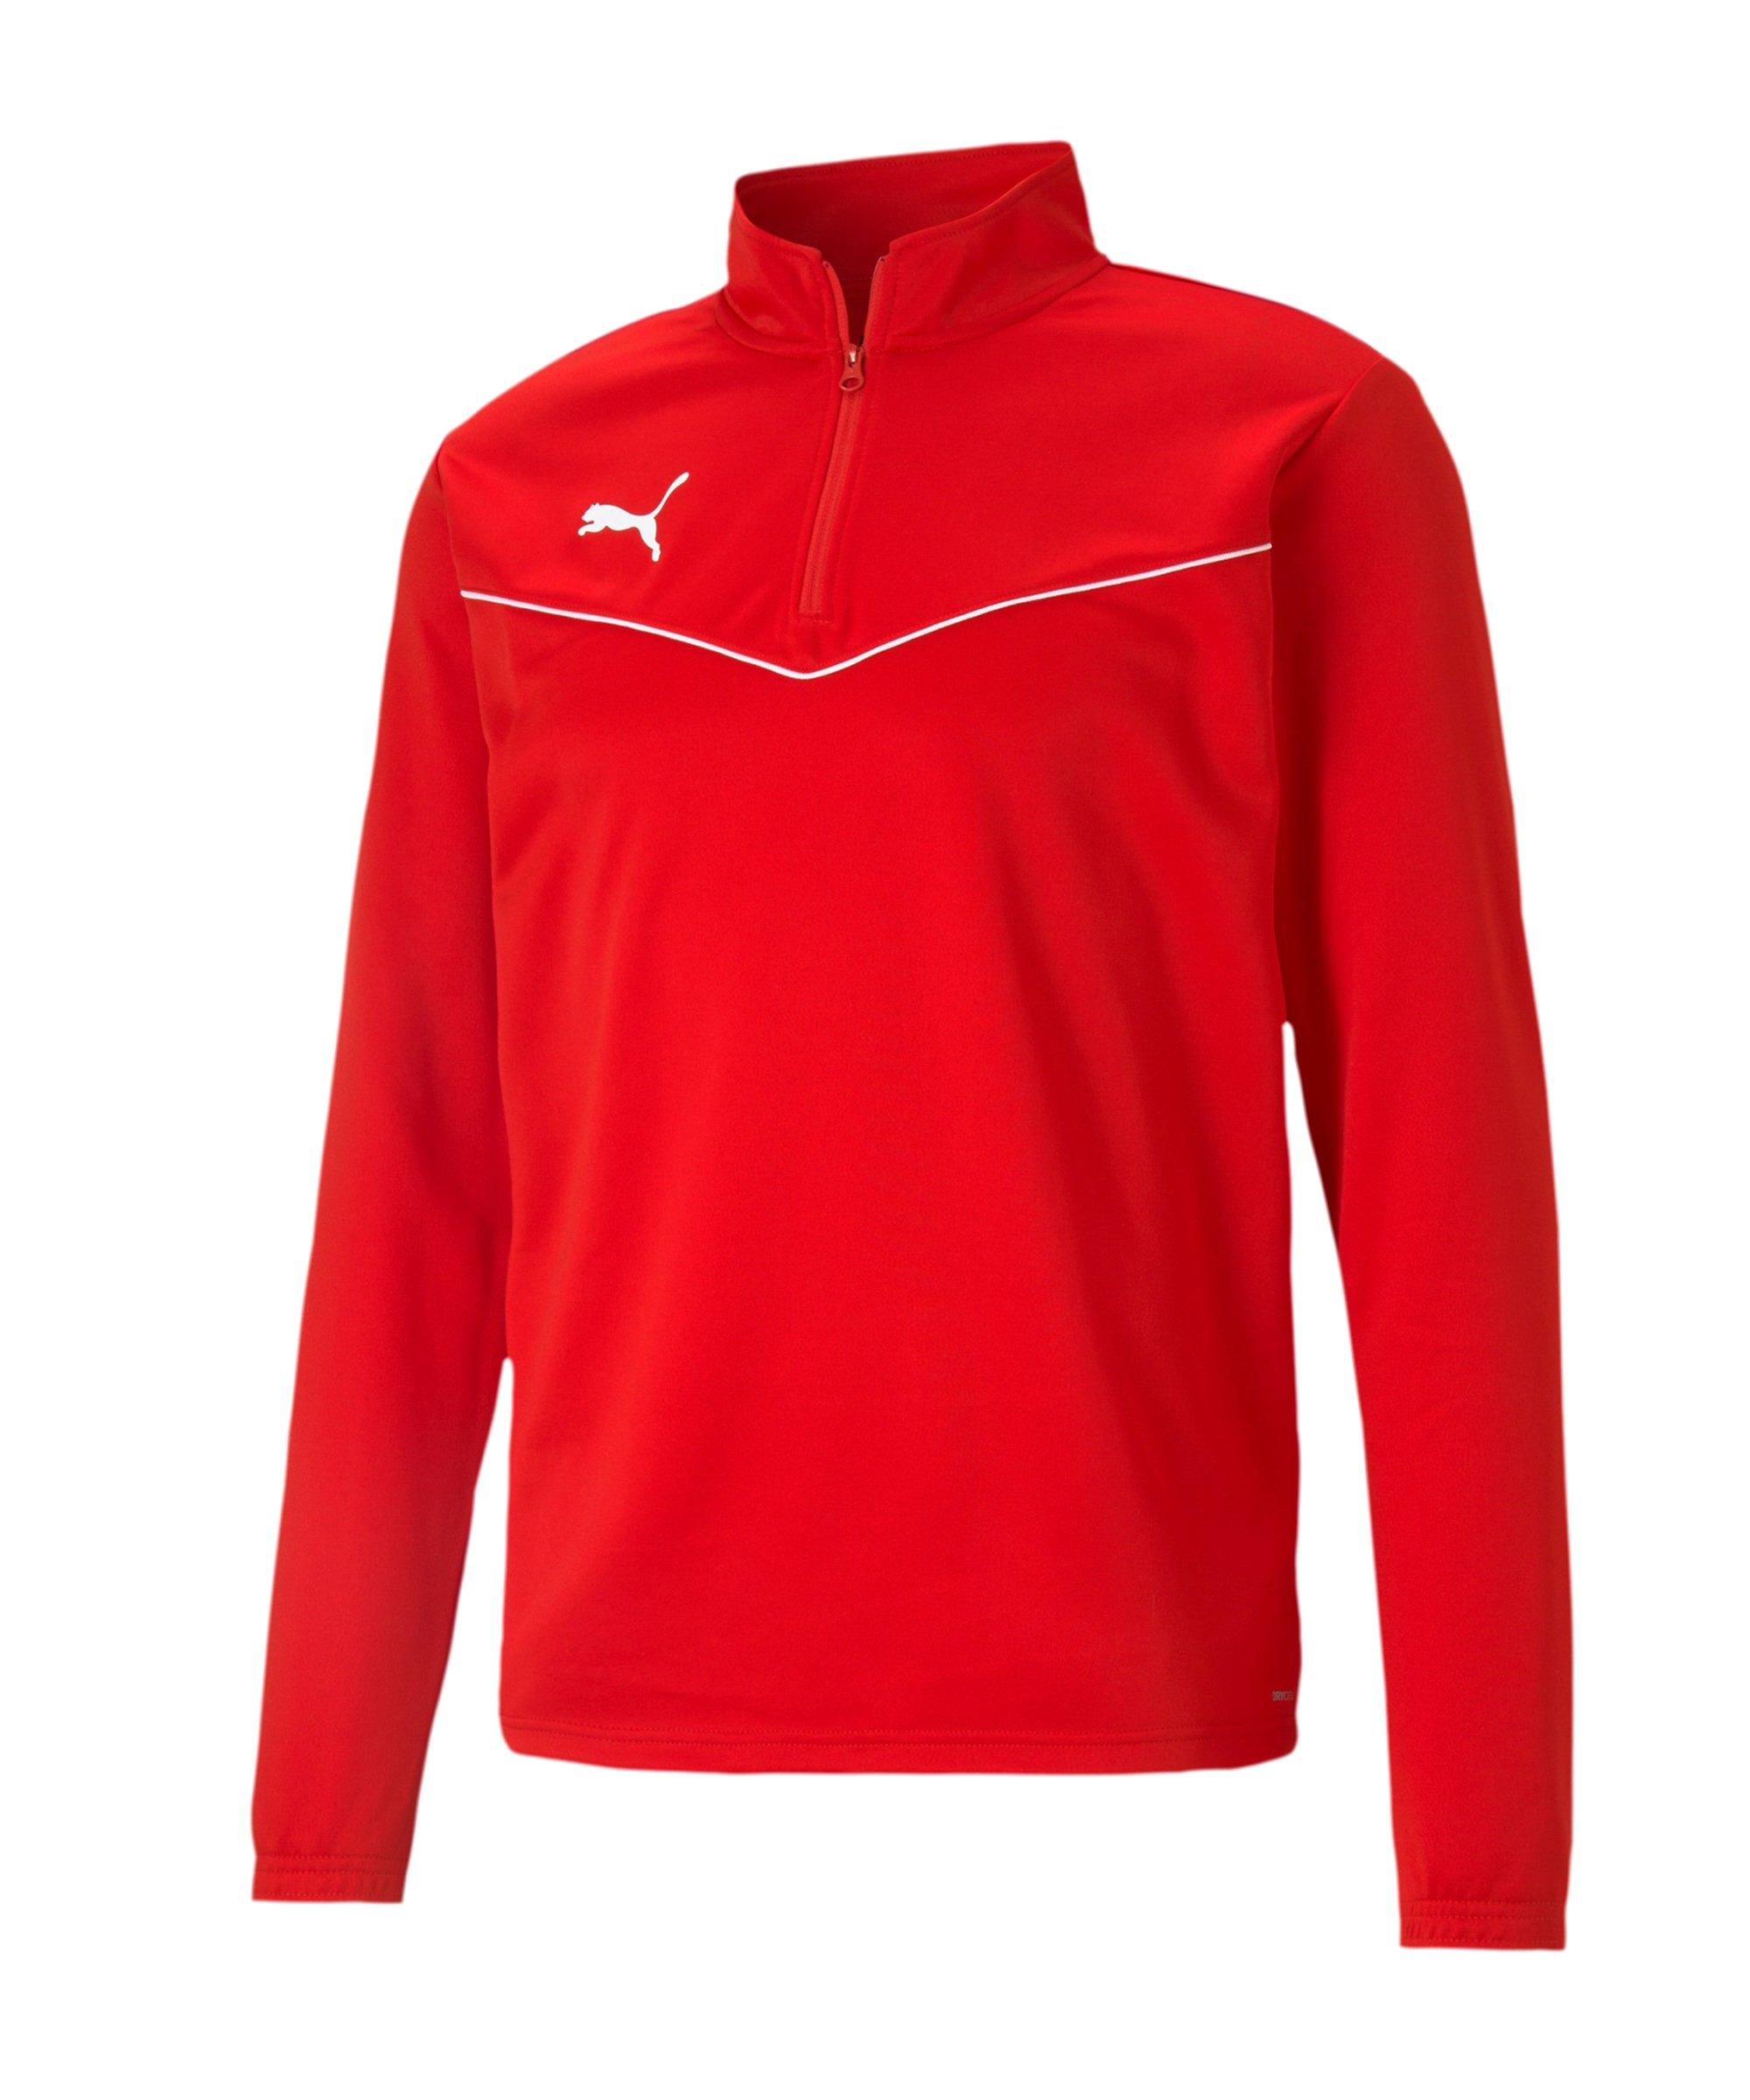 PUMA teamRISE HalfZip Sweatshirt Rot F01 - rot